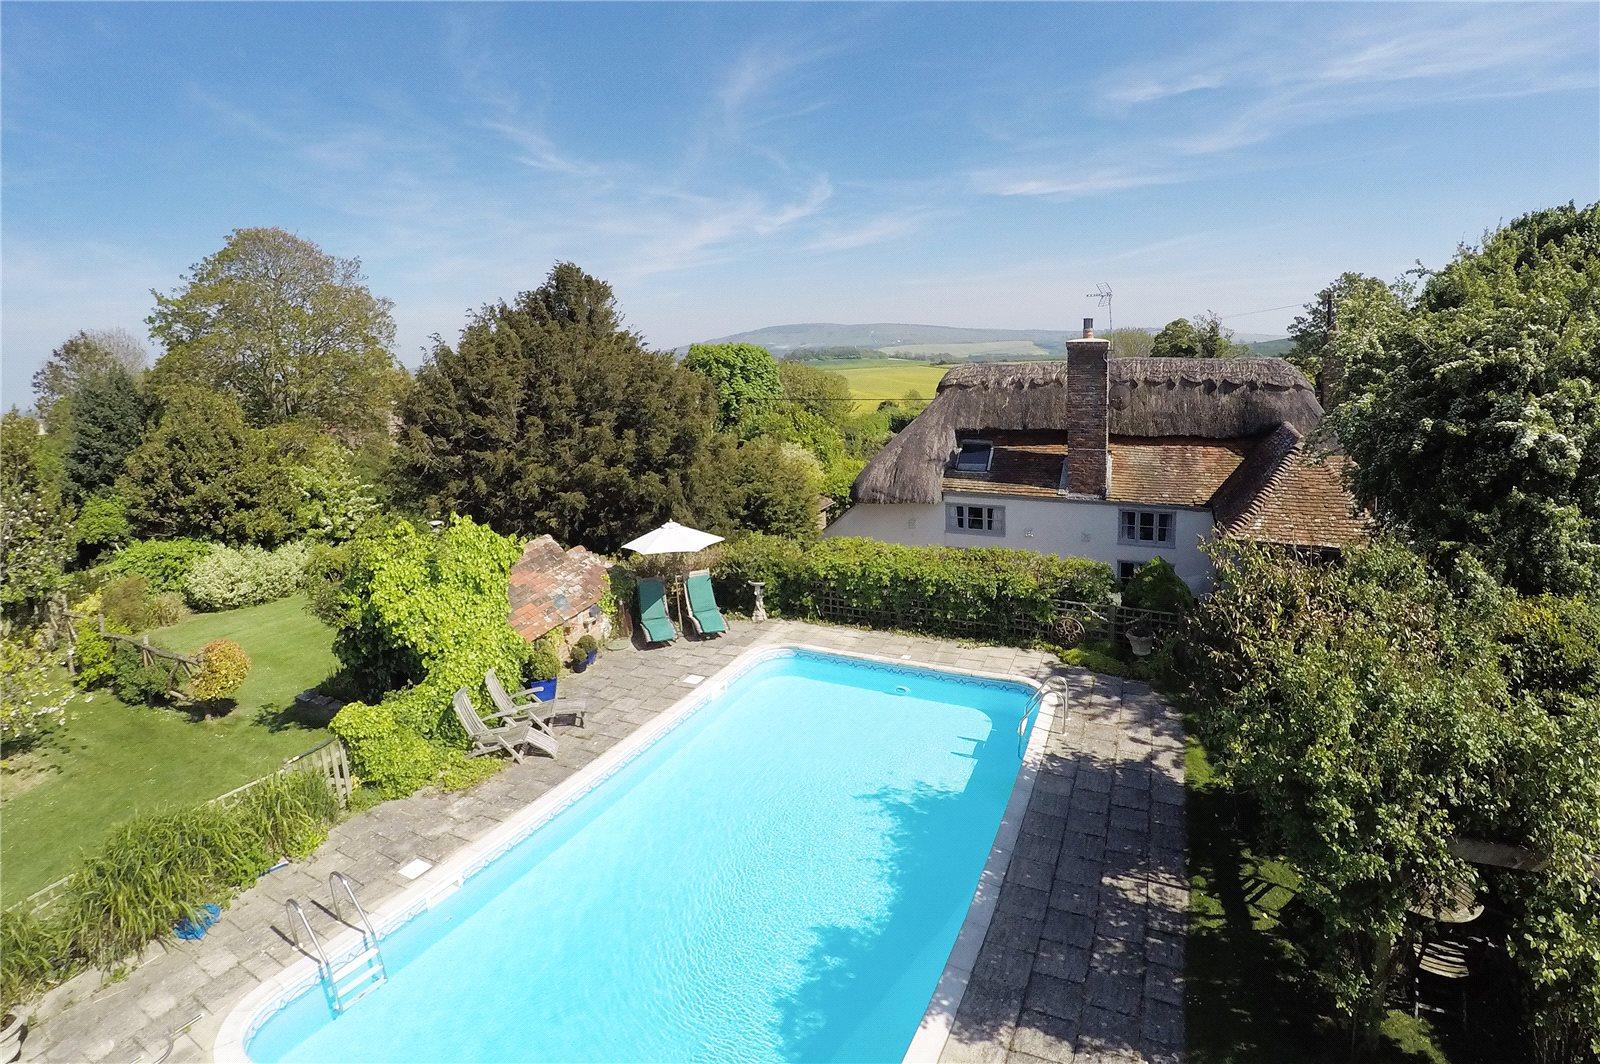 Villa per Vendita alle ore The Village, Alciston, Polegate, East Sussex, BN26 Polegate, Inghilterra